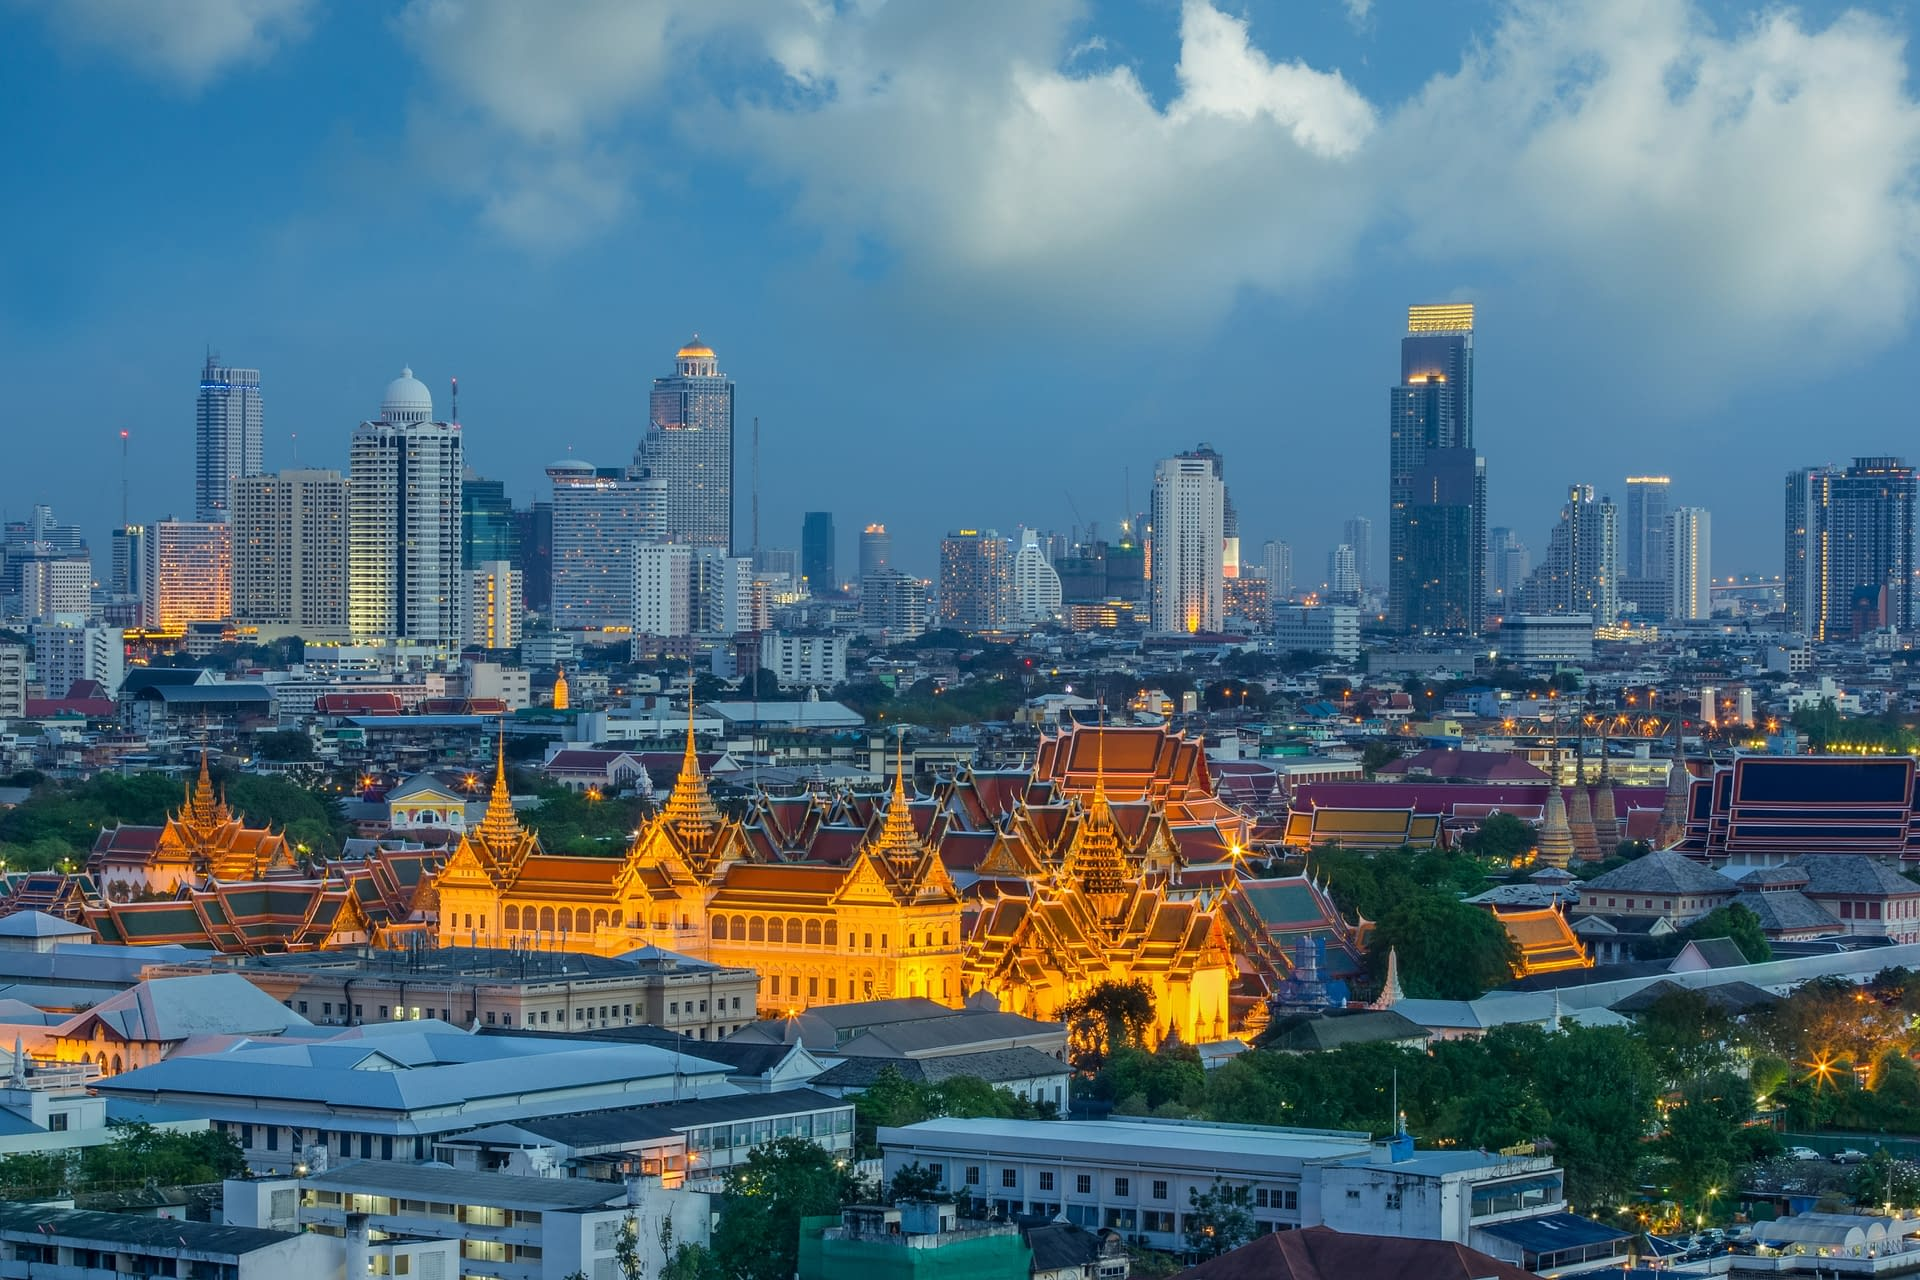 Grand palace at twilight in Bangkok between Loykratong festival, Thailand